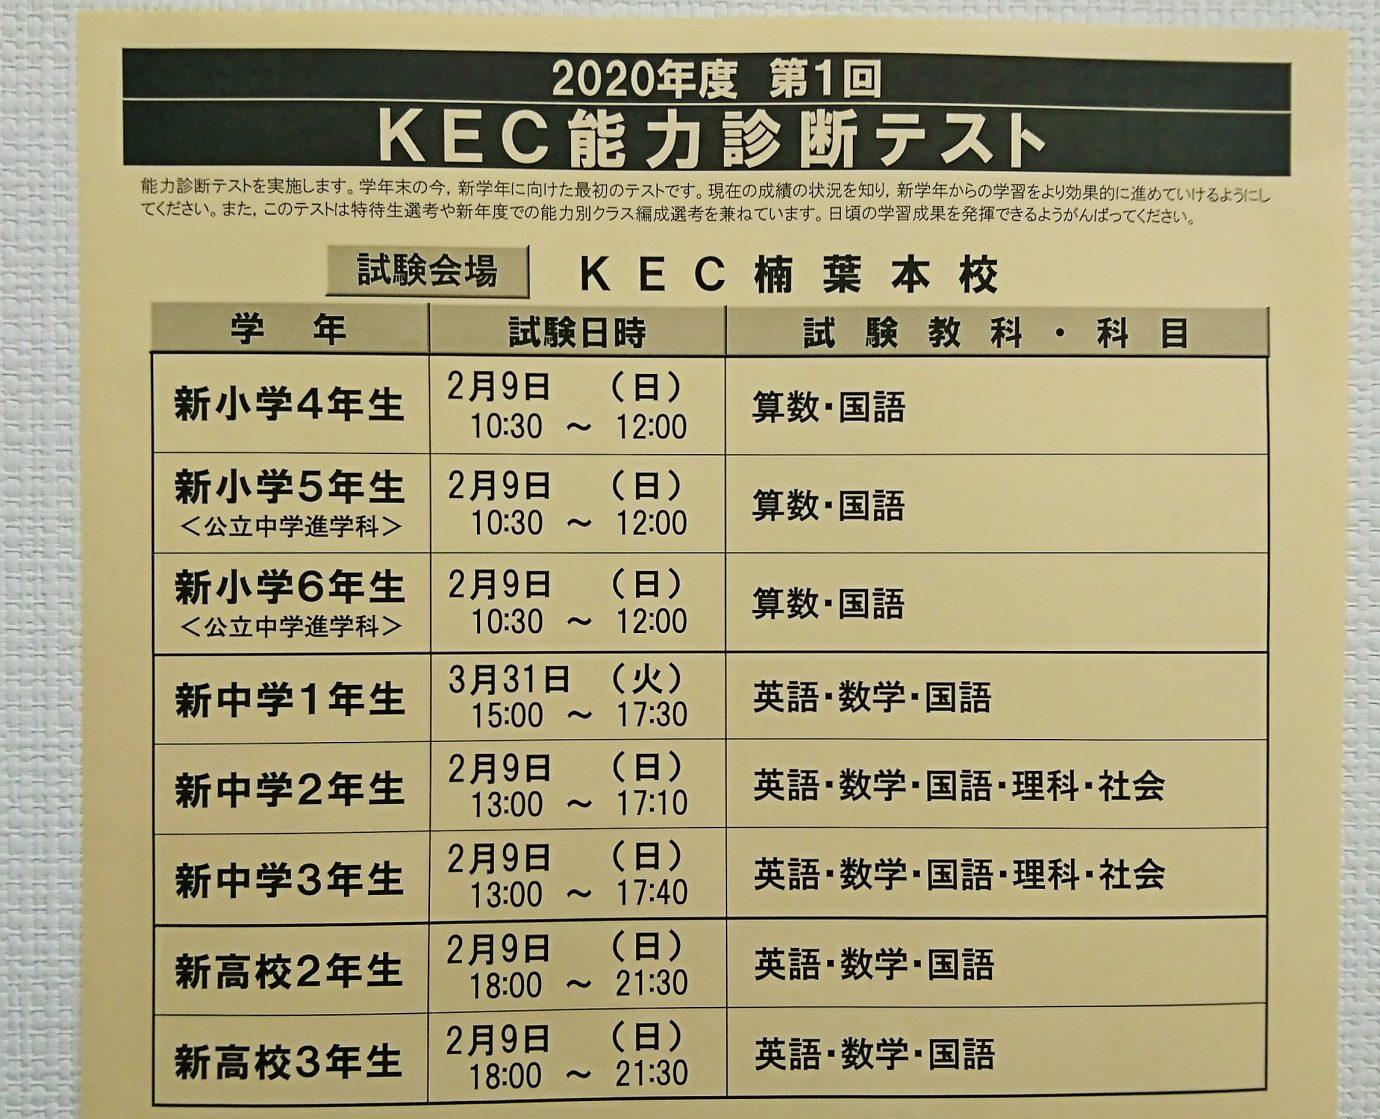 KEC_塾_予備校_楠葉本校_能力診断テスト